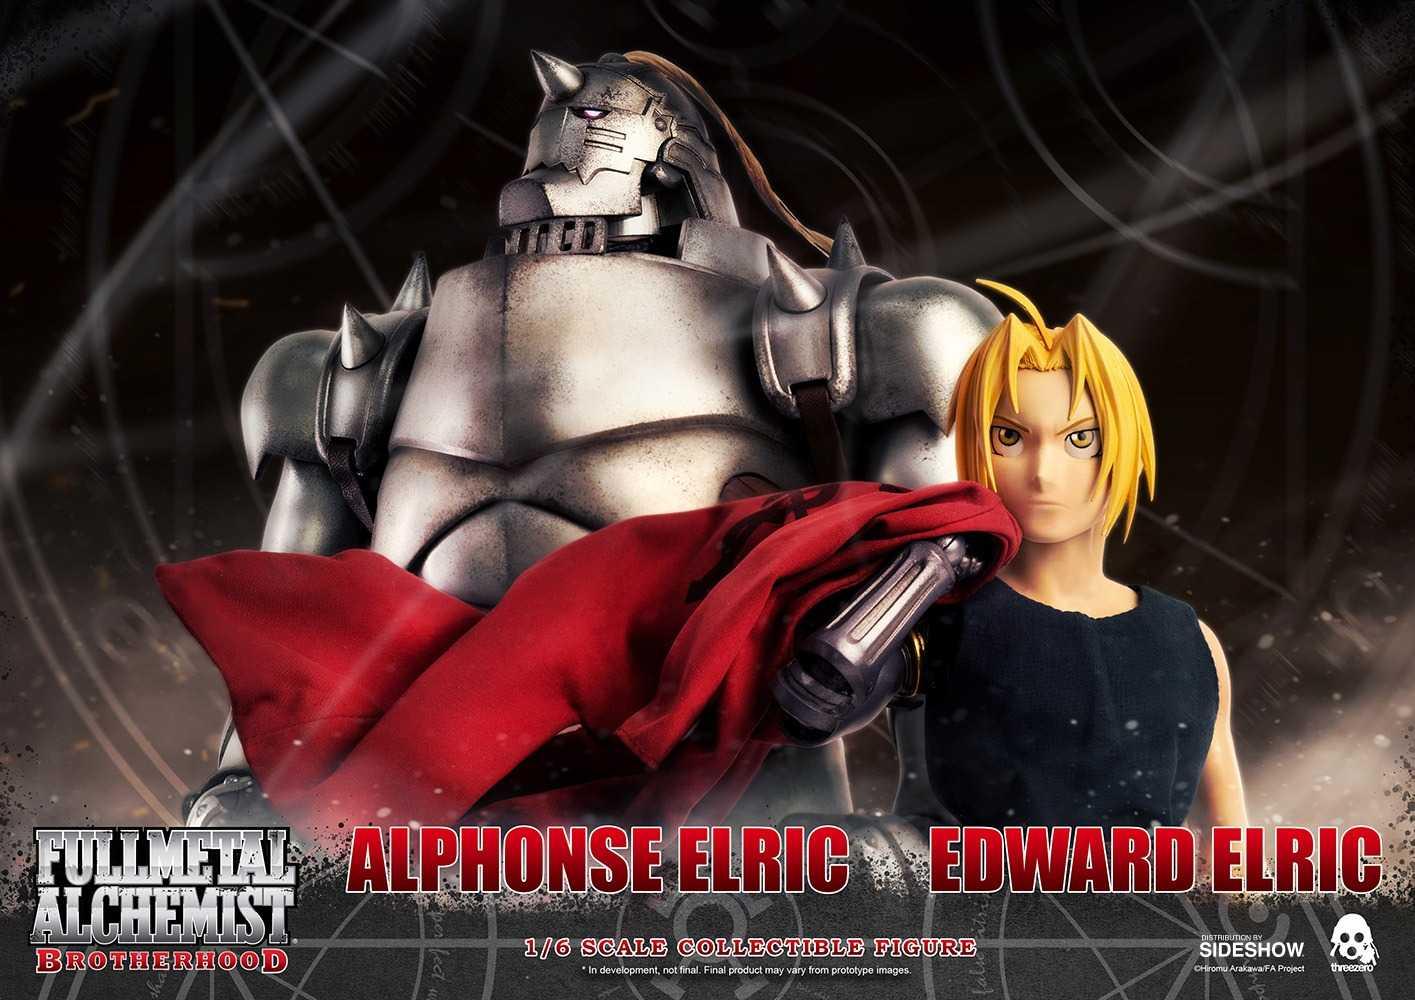 ست اکشن فیگور اِدوارد و آلفونسو الریک Full Metal Alchemist